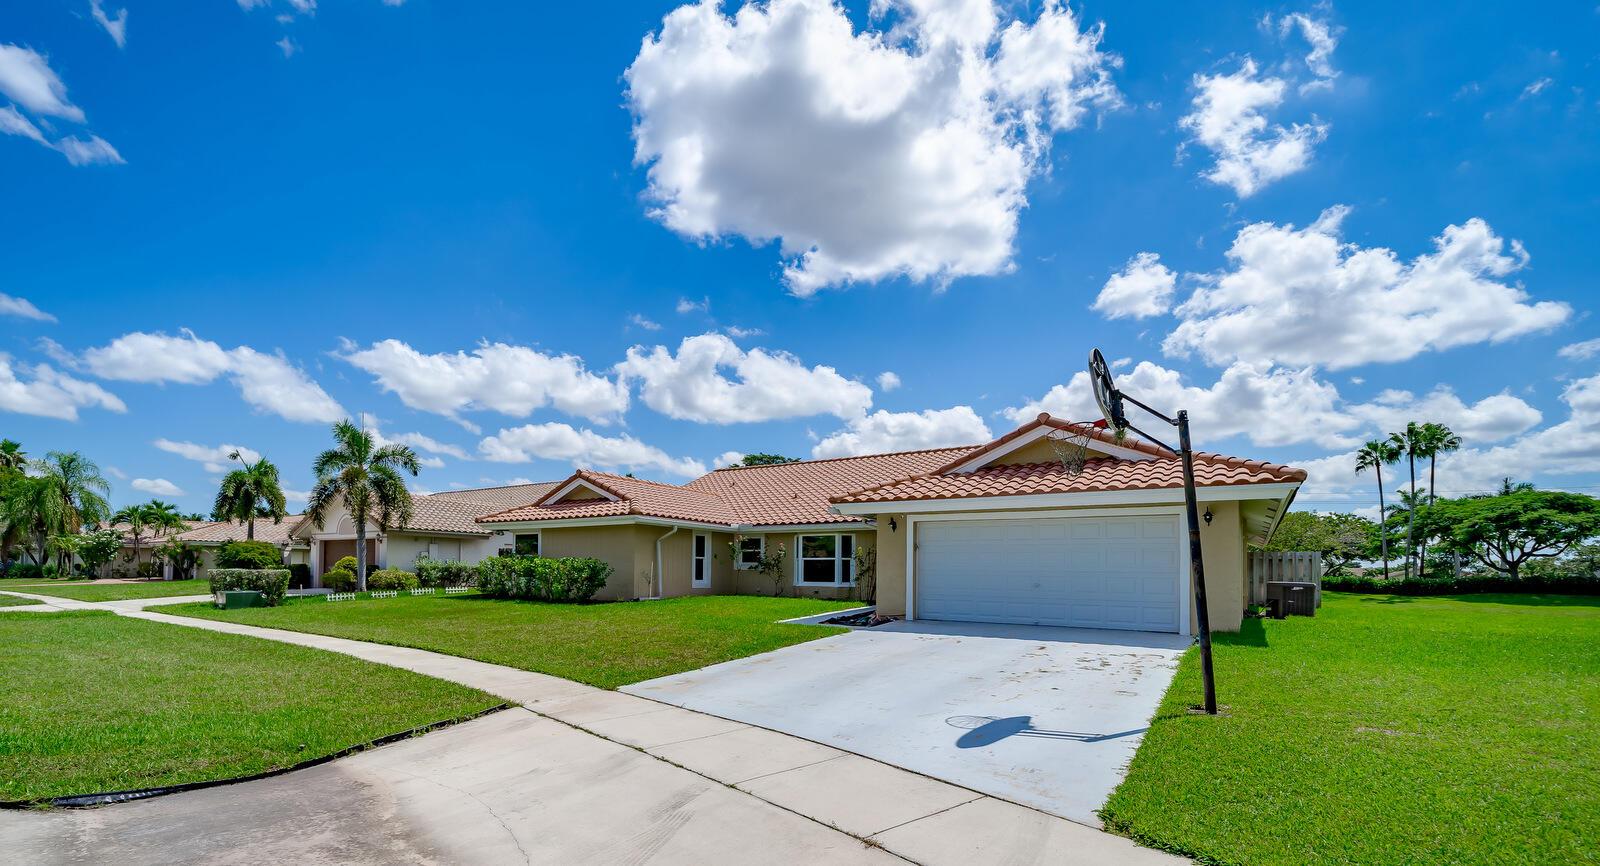 11540  Island Lakes Lane  For Sale 10748470, FL